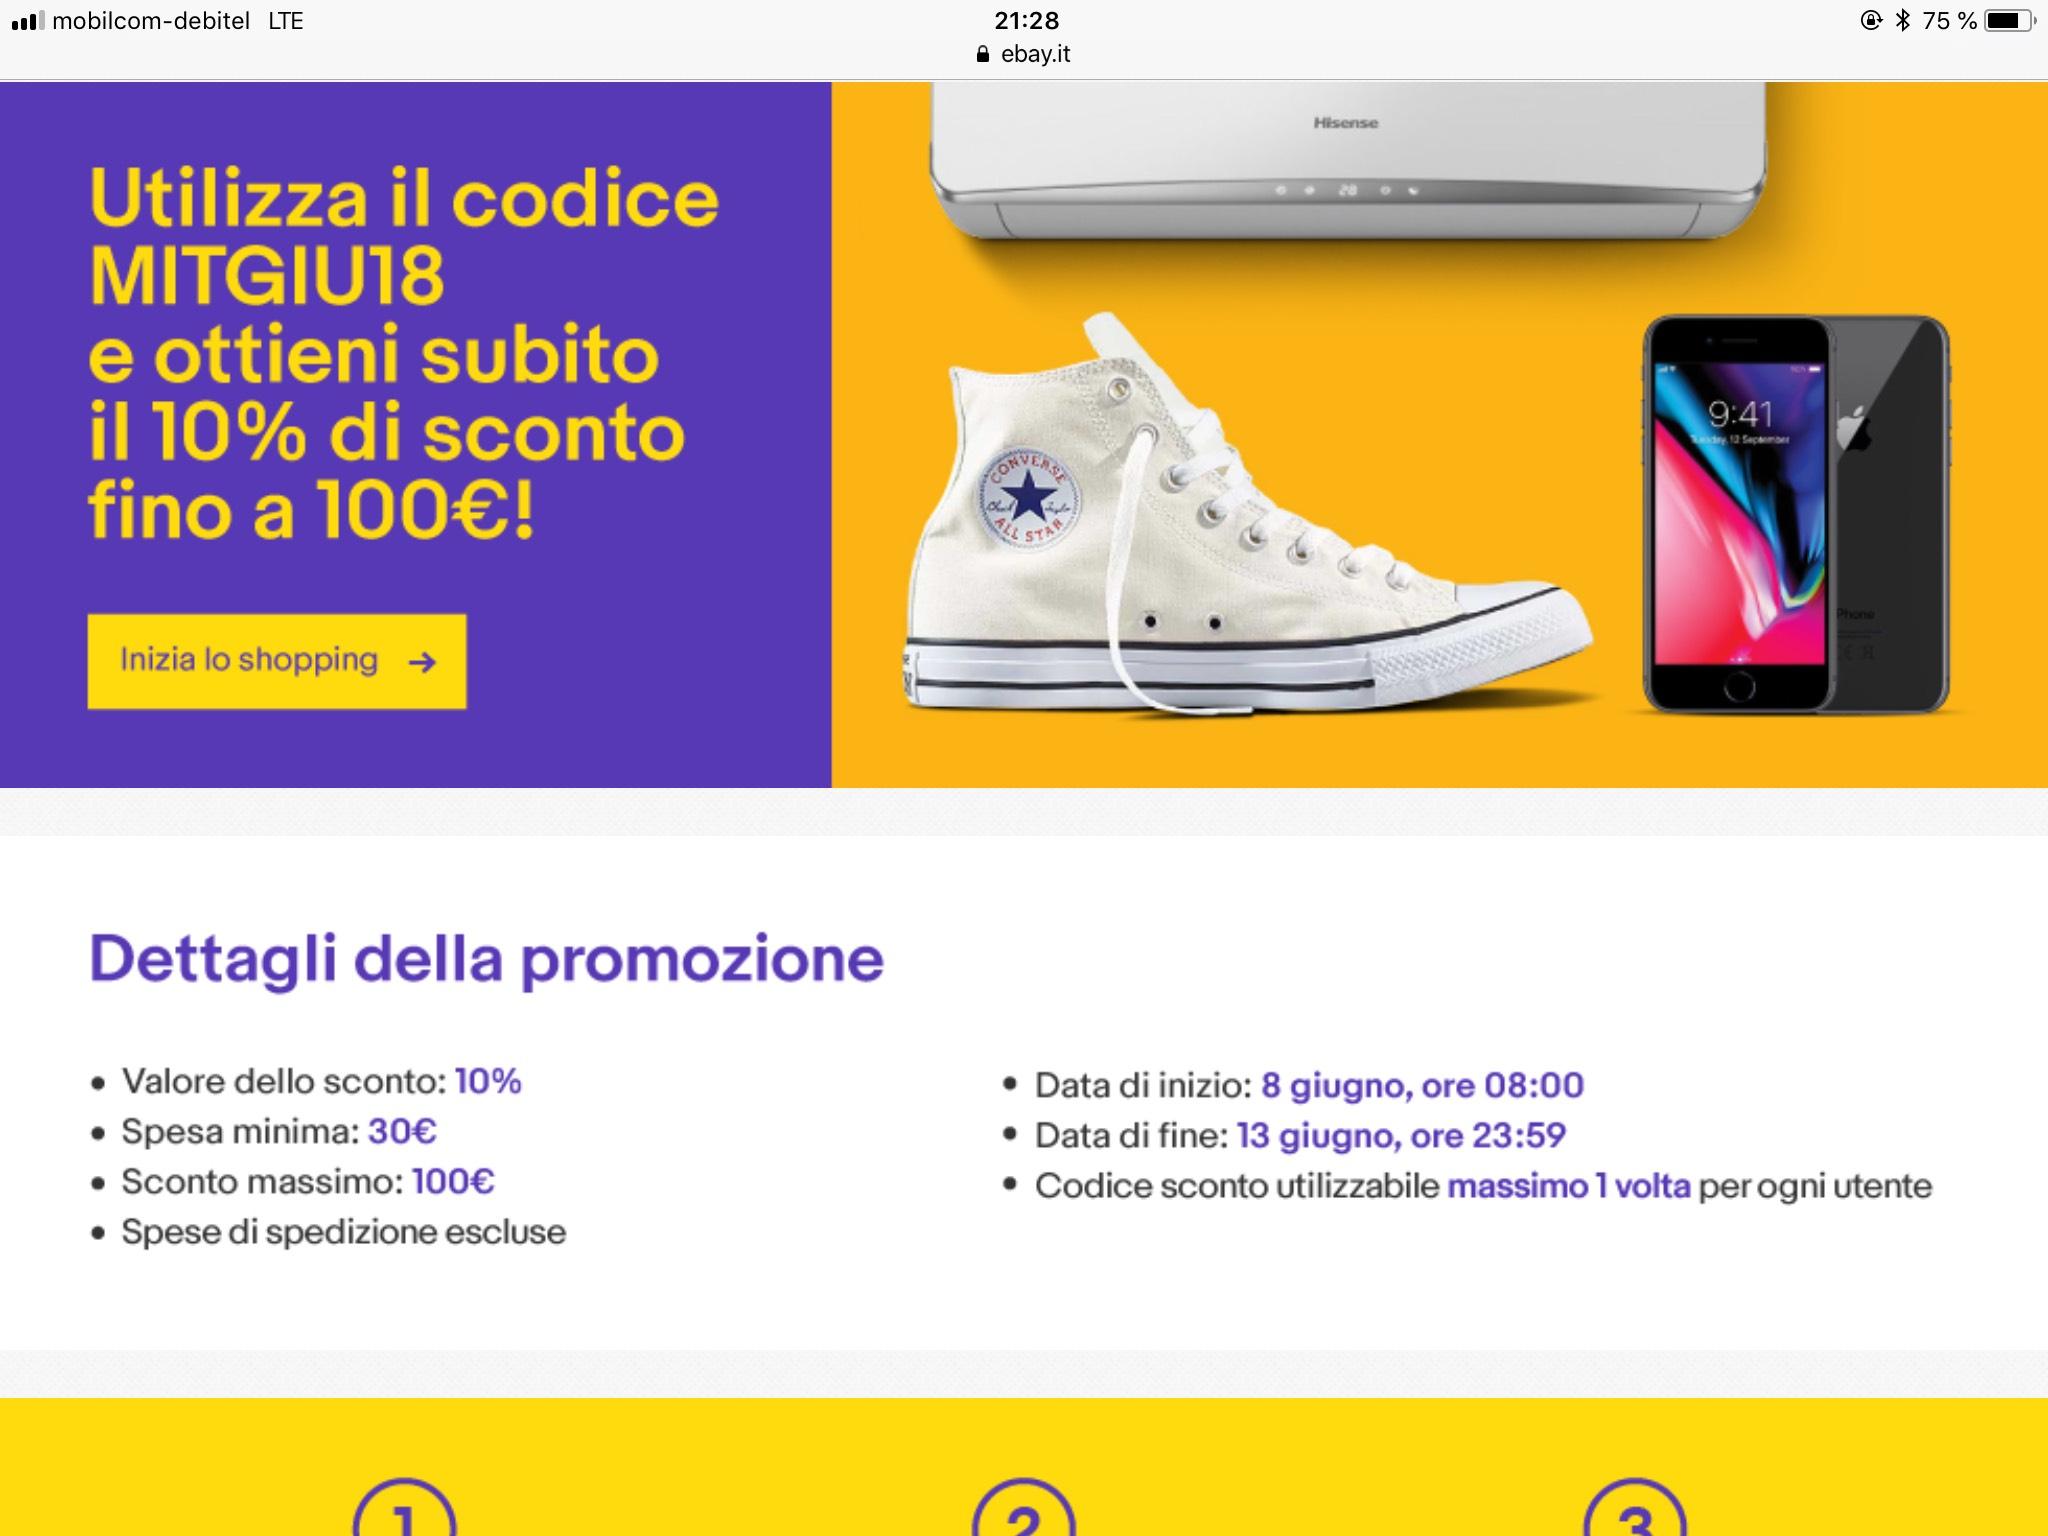 Ebay Italien 10% auf fast Alles. Maximal 100€. Umzug